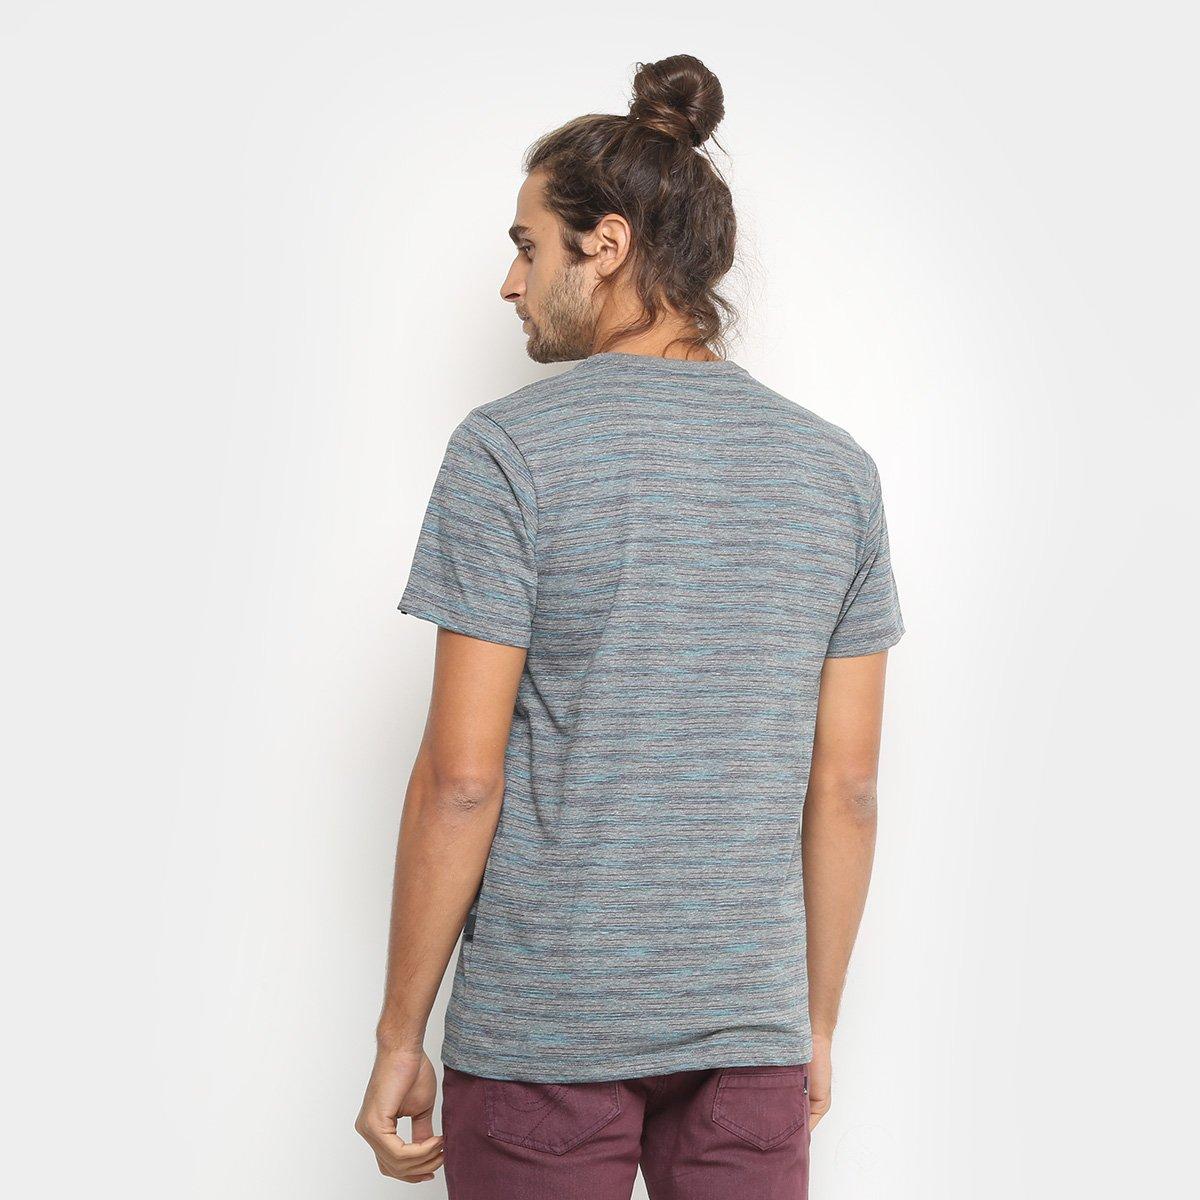 844b164dc1 Camiseta Quiksilver Listrada Especial Street Masculina  Camiseta Quiksilver  Listrada Especial Street Masculina ...